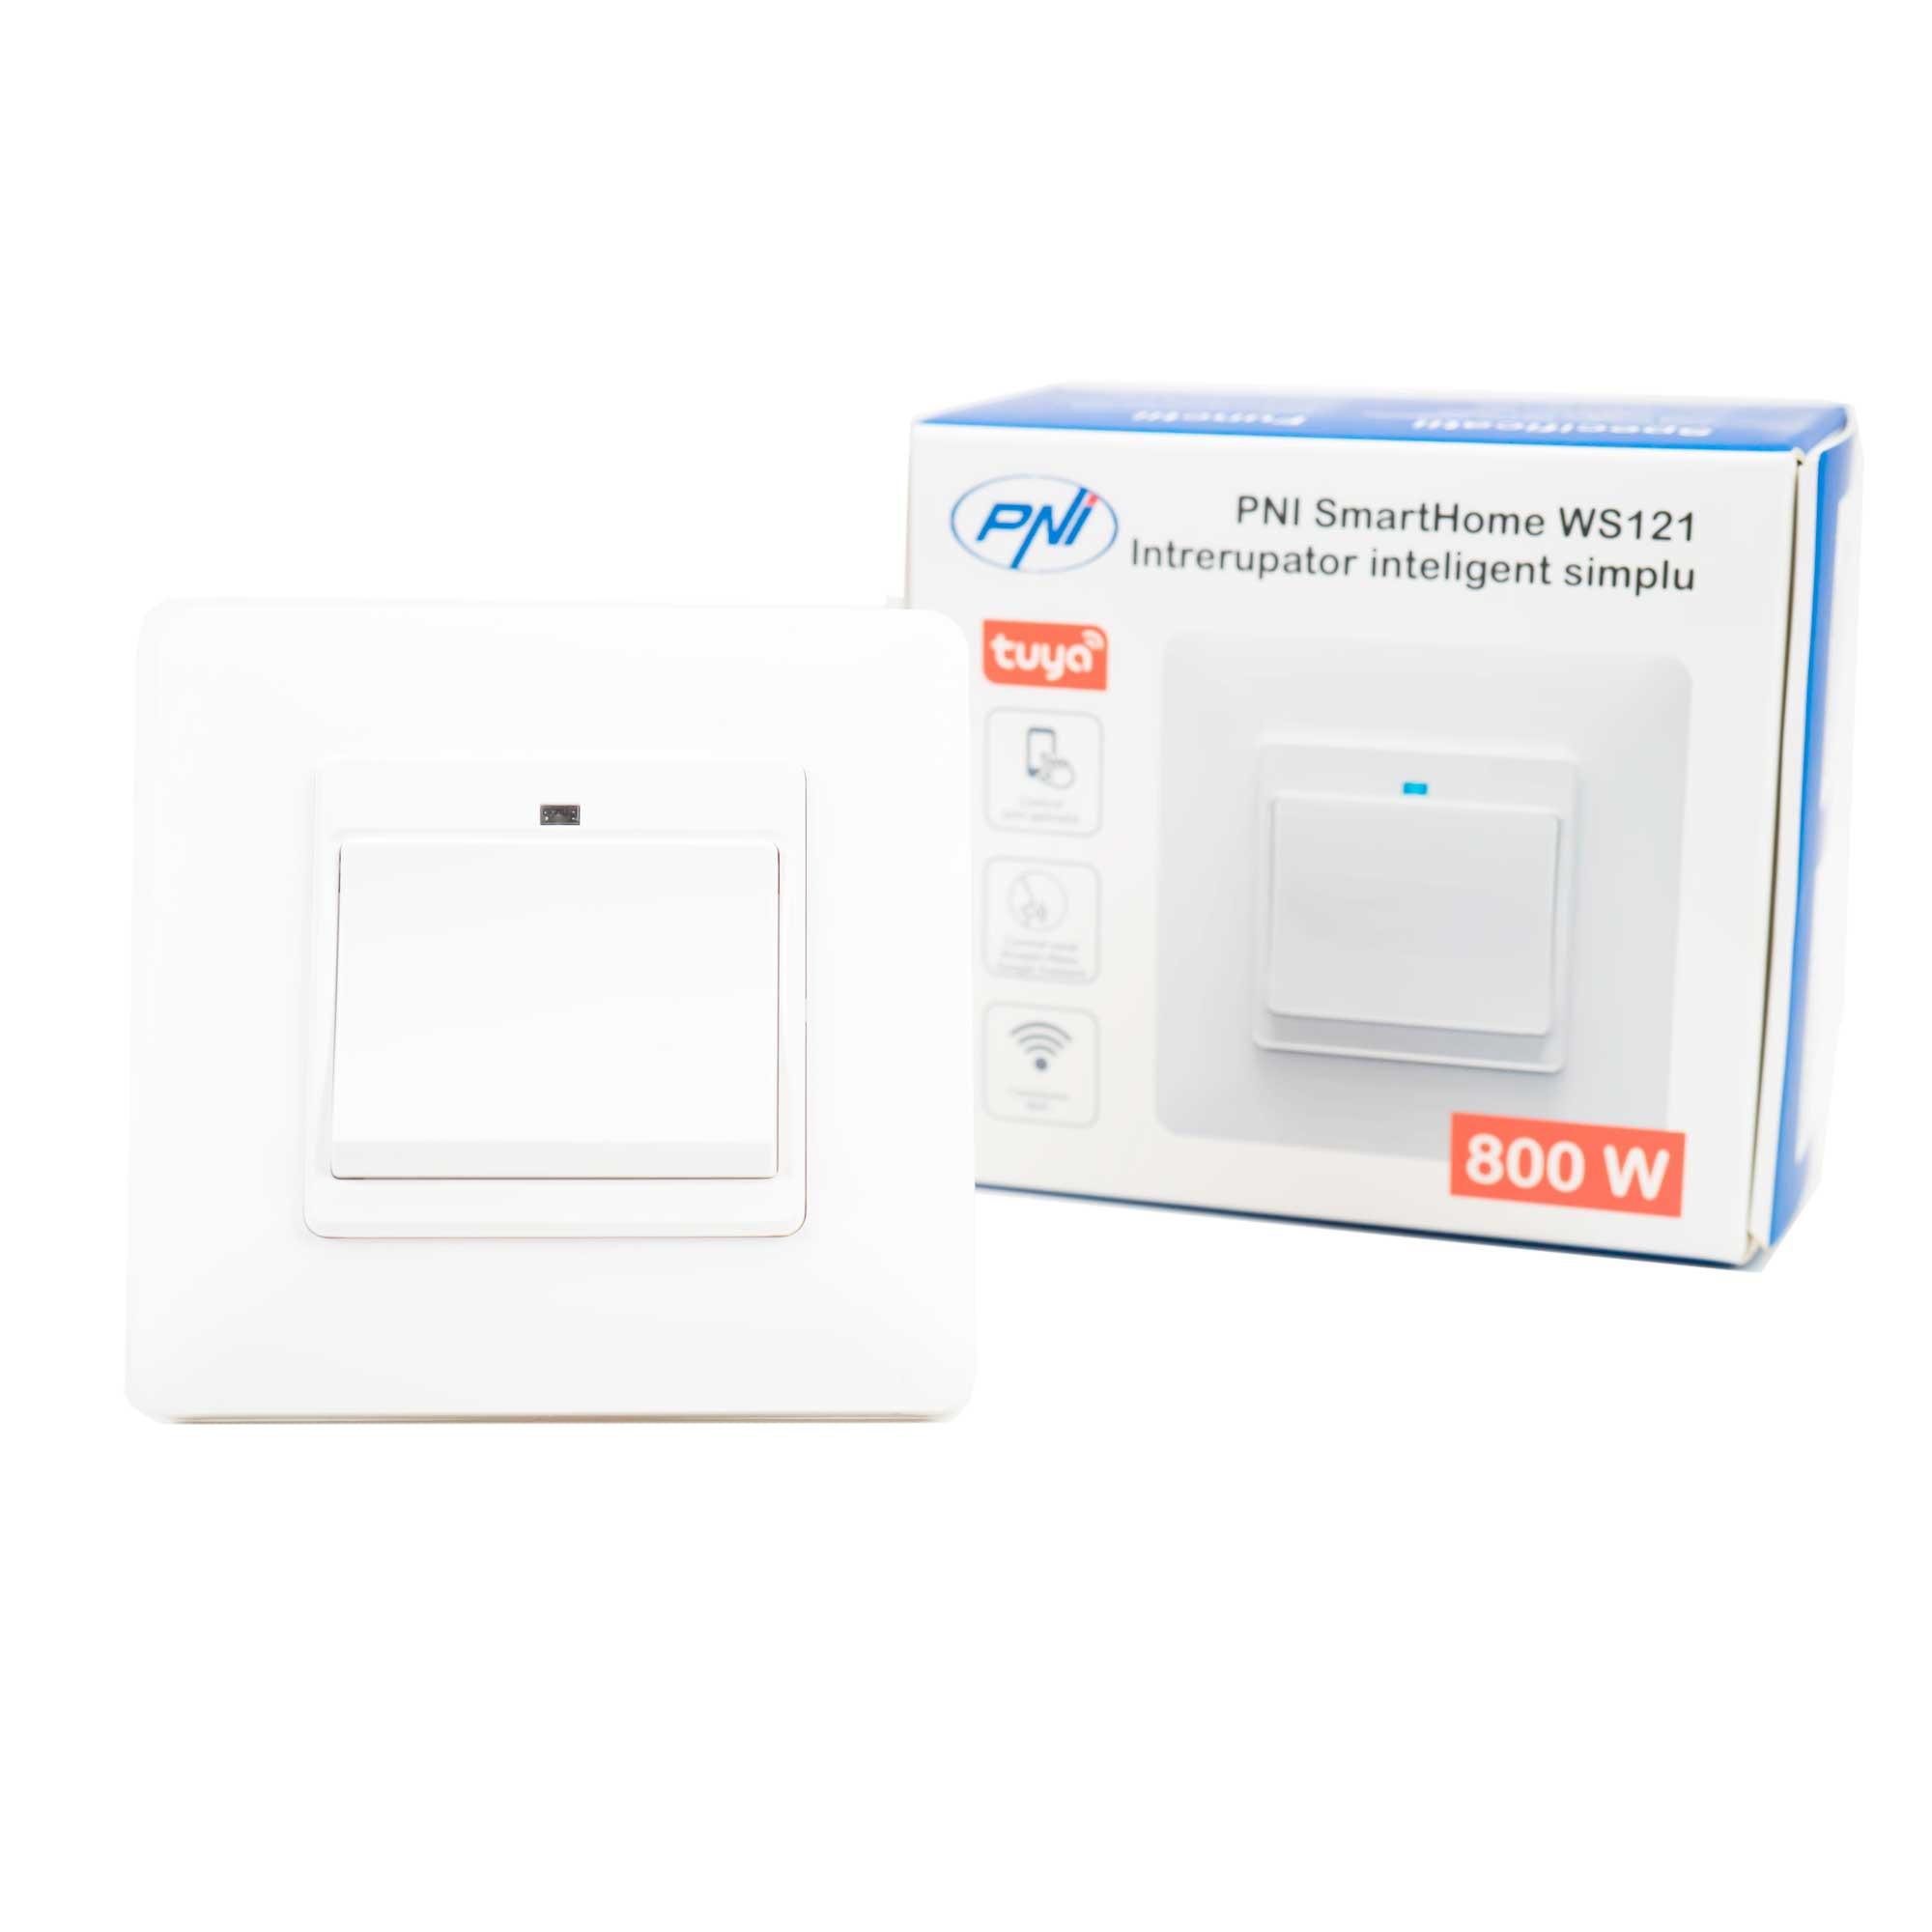 Fotografie Intrerupator inteligent simplu PNI SmartHome WS121 pentru control lumini prin internet cu App Tuya Smart, compatibil Amazon Alexa si Google Home